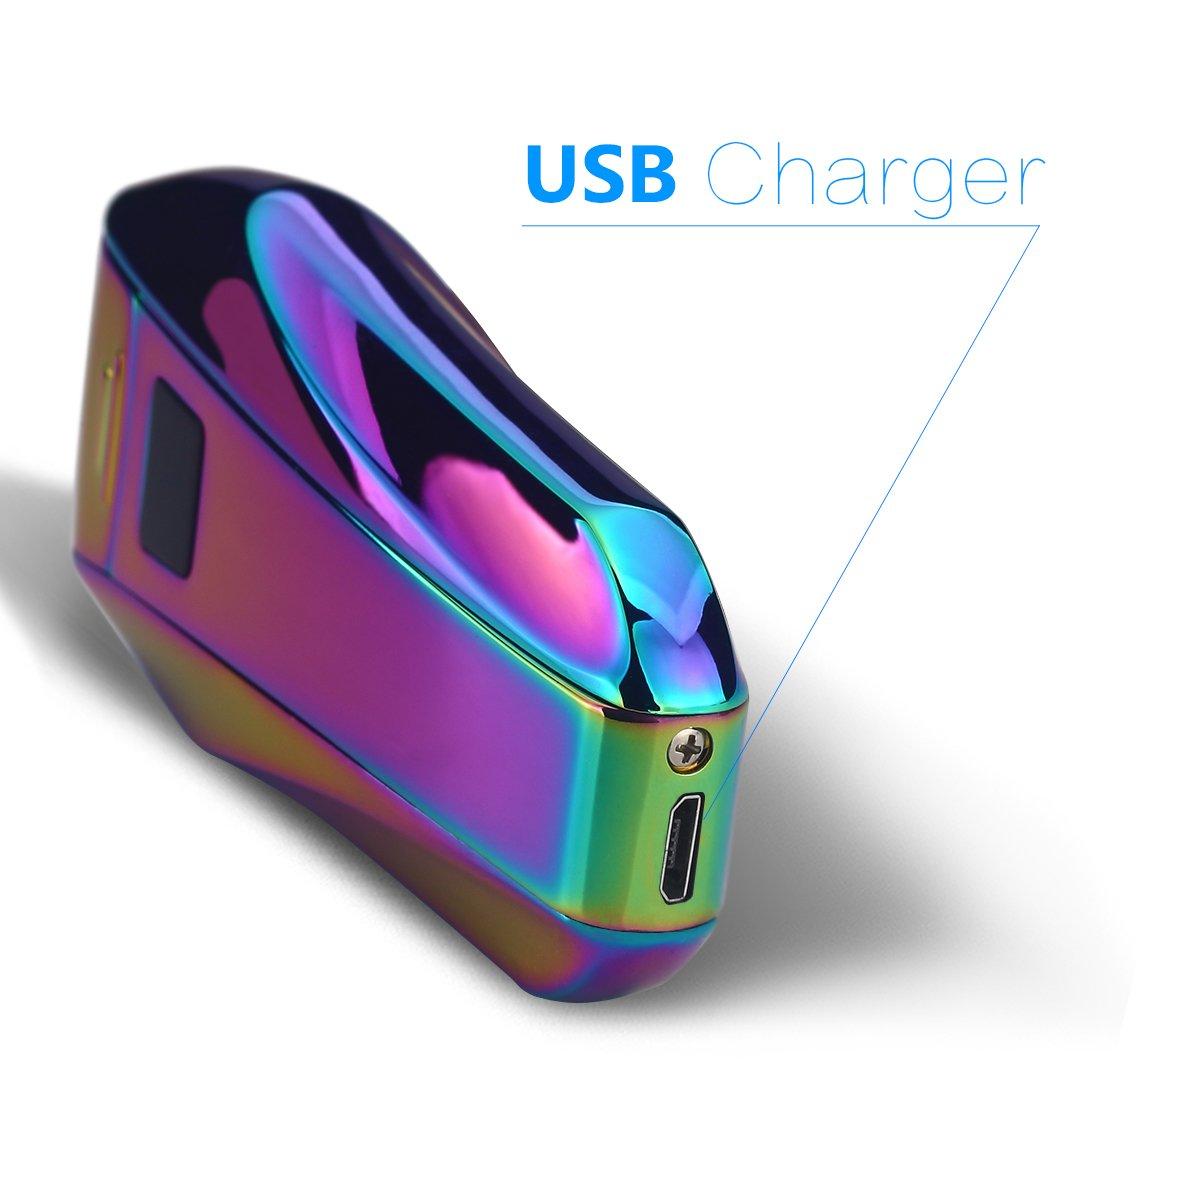 f62da38ed15e72 Amazon.de  GreenGrass Elektro Feuerzeug USB